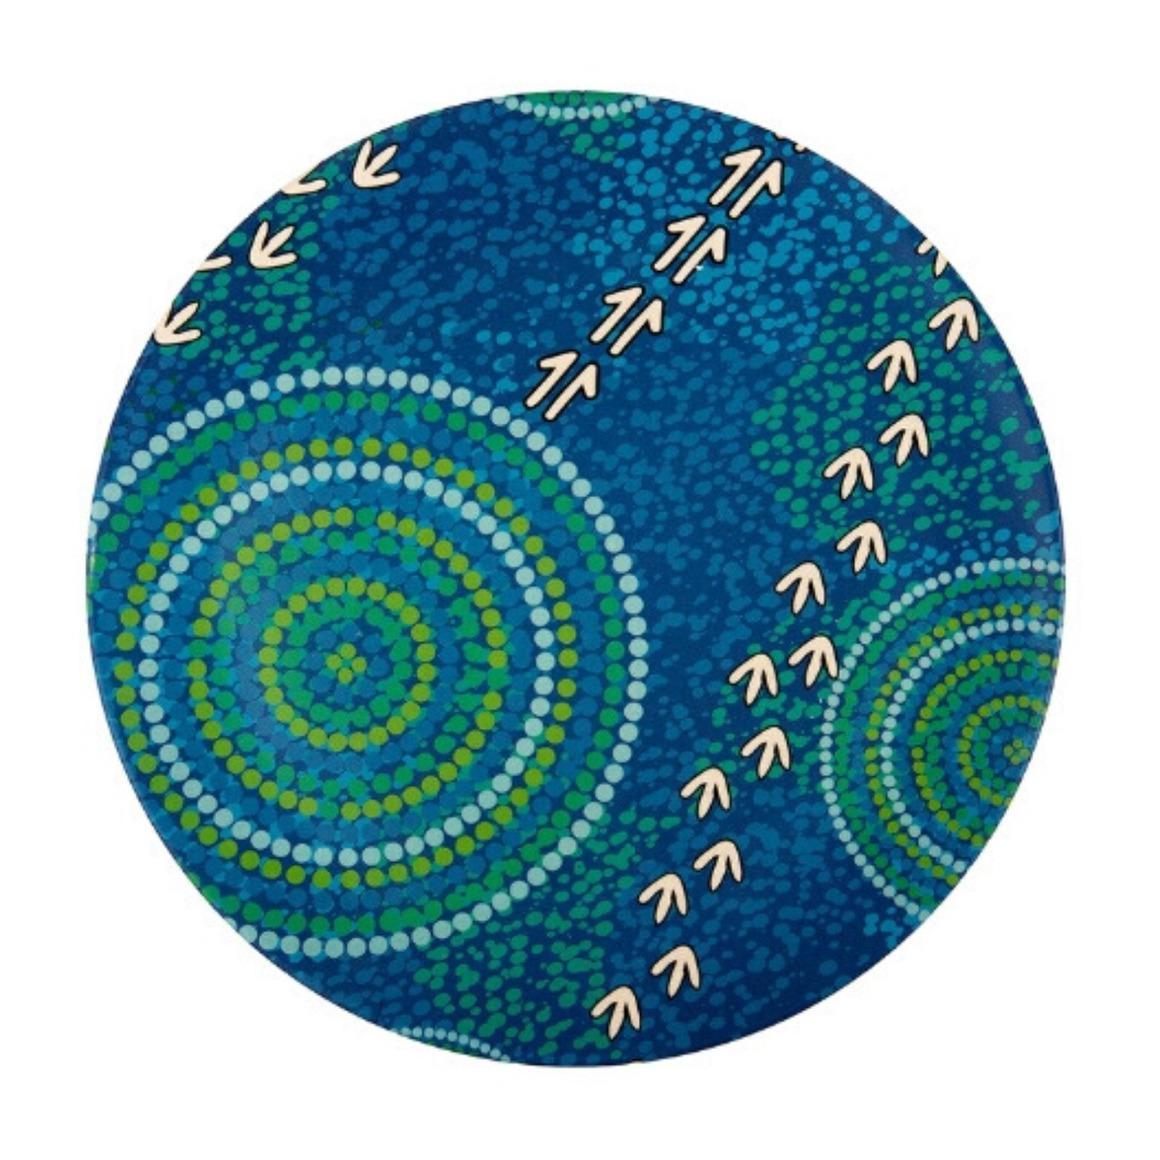 Plate Bamboo Aboriginal Design - Wet Design - Luther Cora (Set of 2)   Trada Marketplace